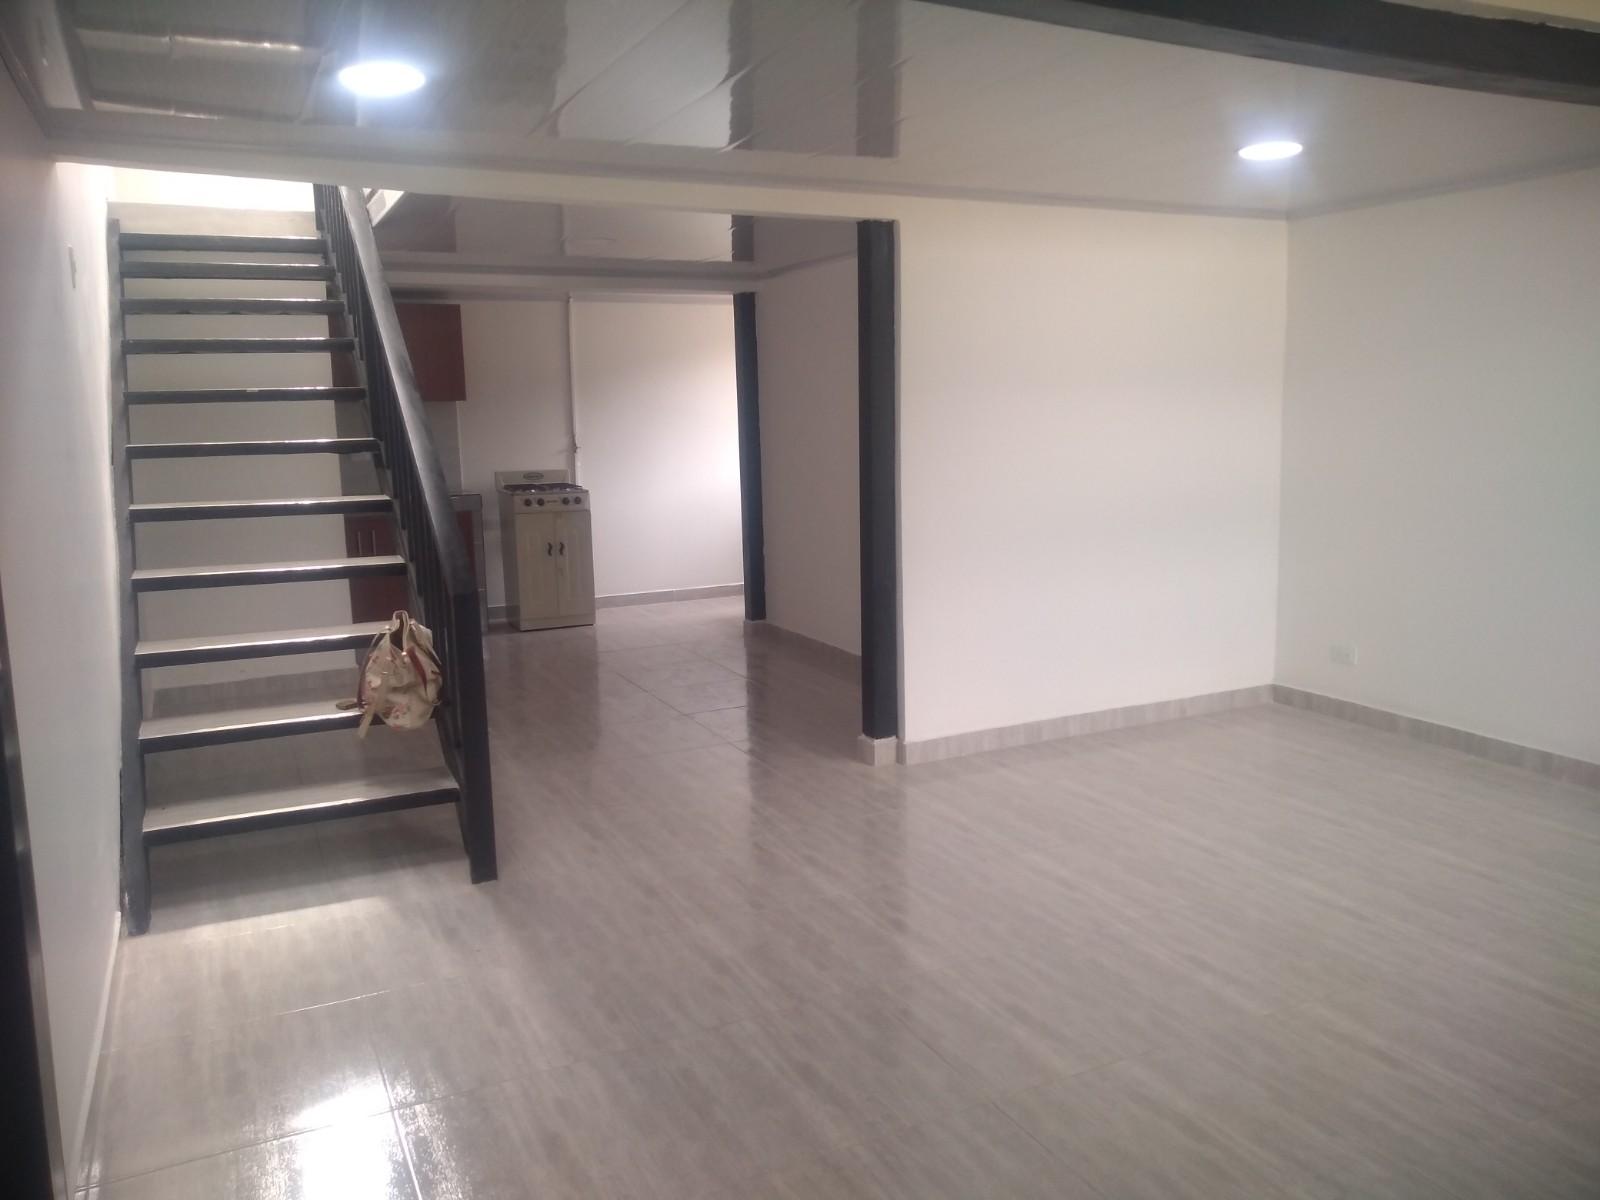 CVOC-0123 Se vende casa en Villamaría, en sector residencial.